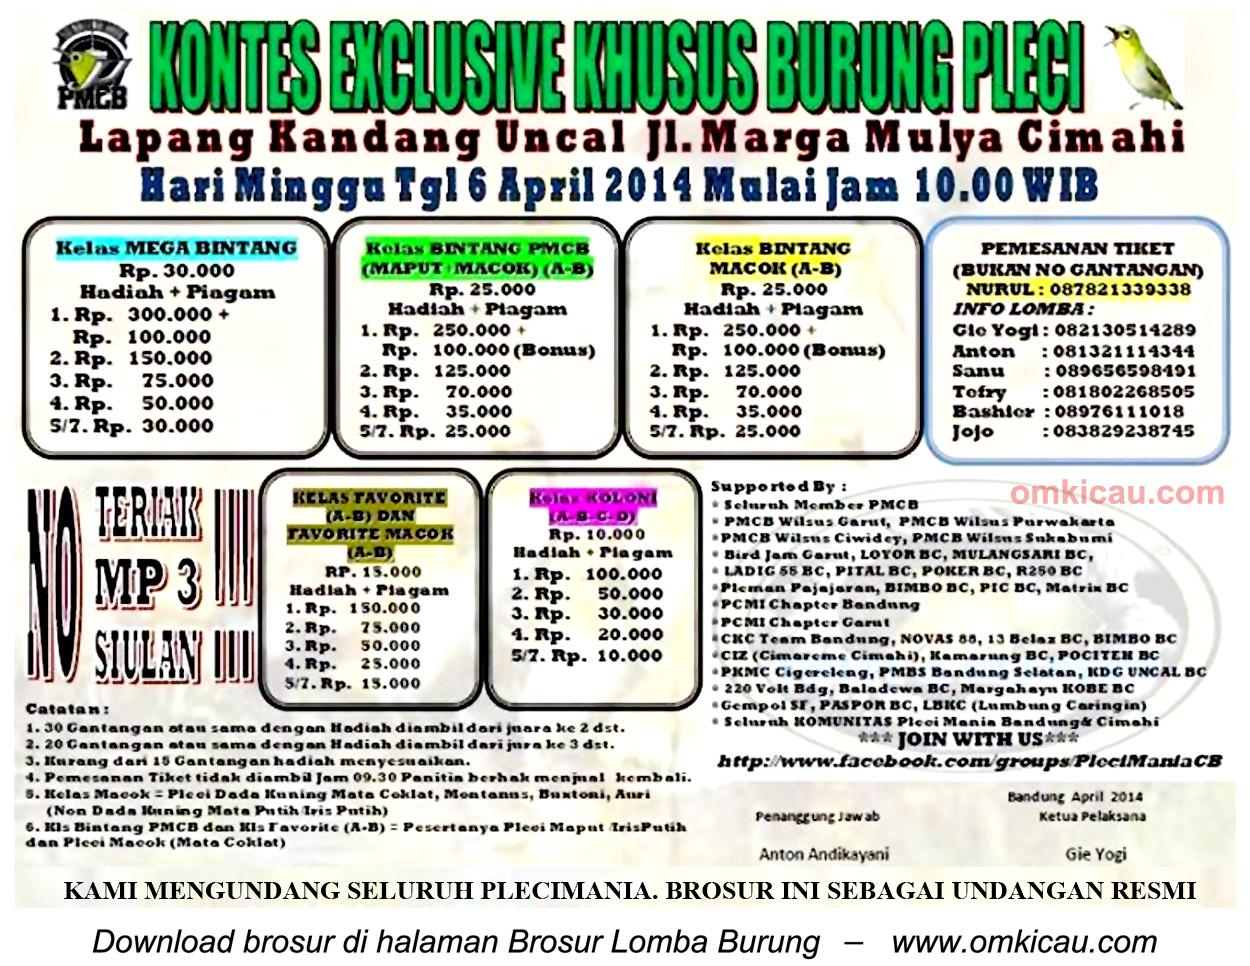 Brosur Kontes Exclusive Khusus Burung Pleci, Cimahi, 6 April 2014